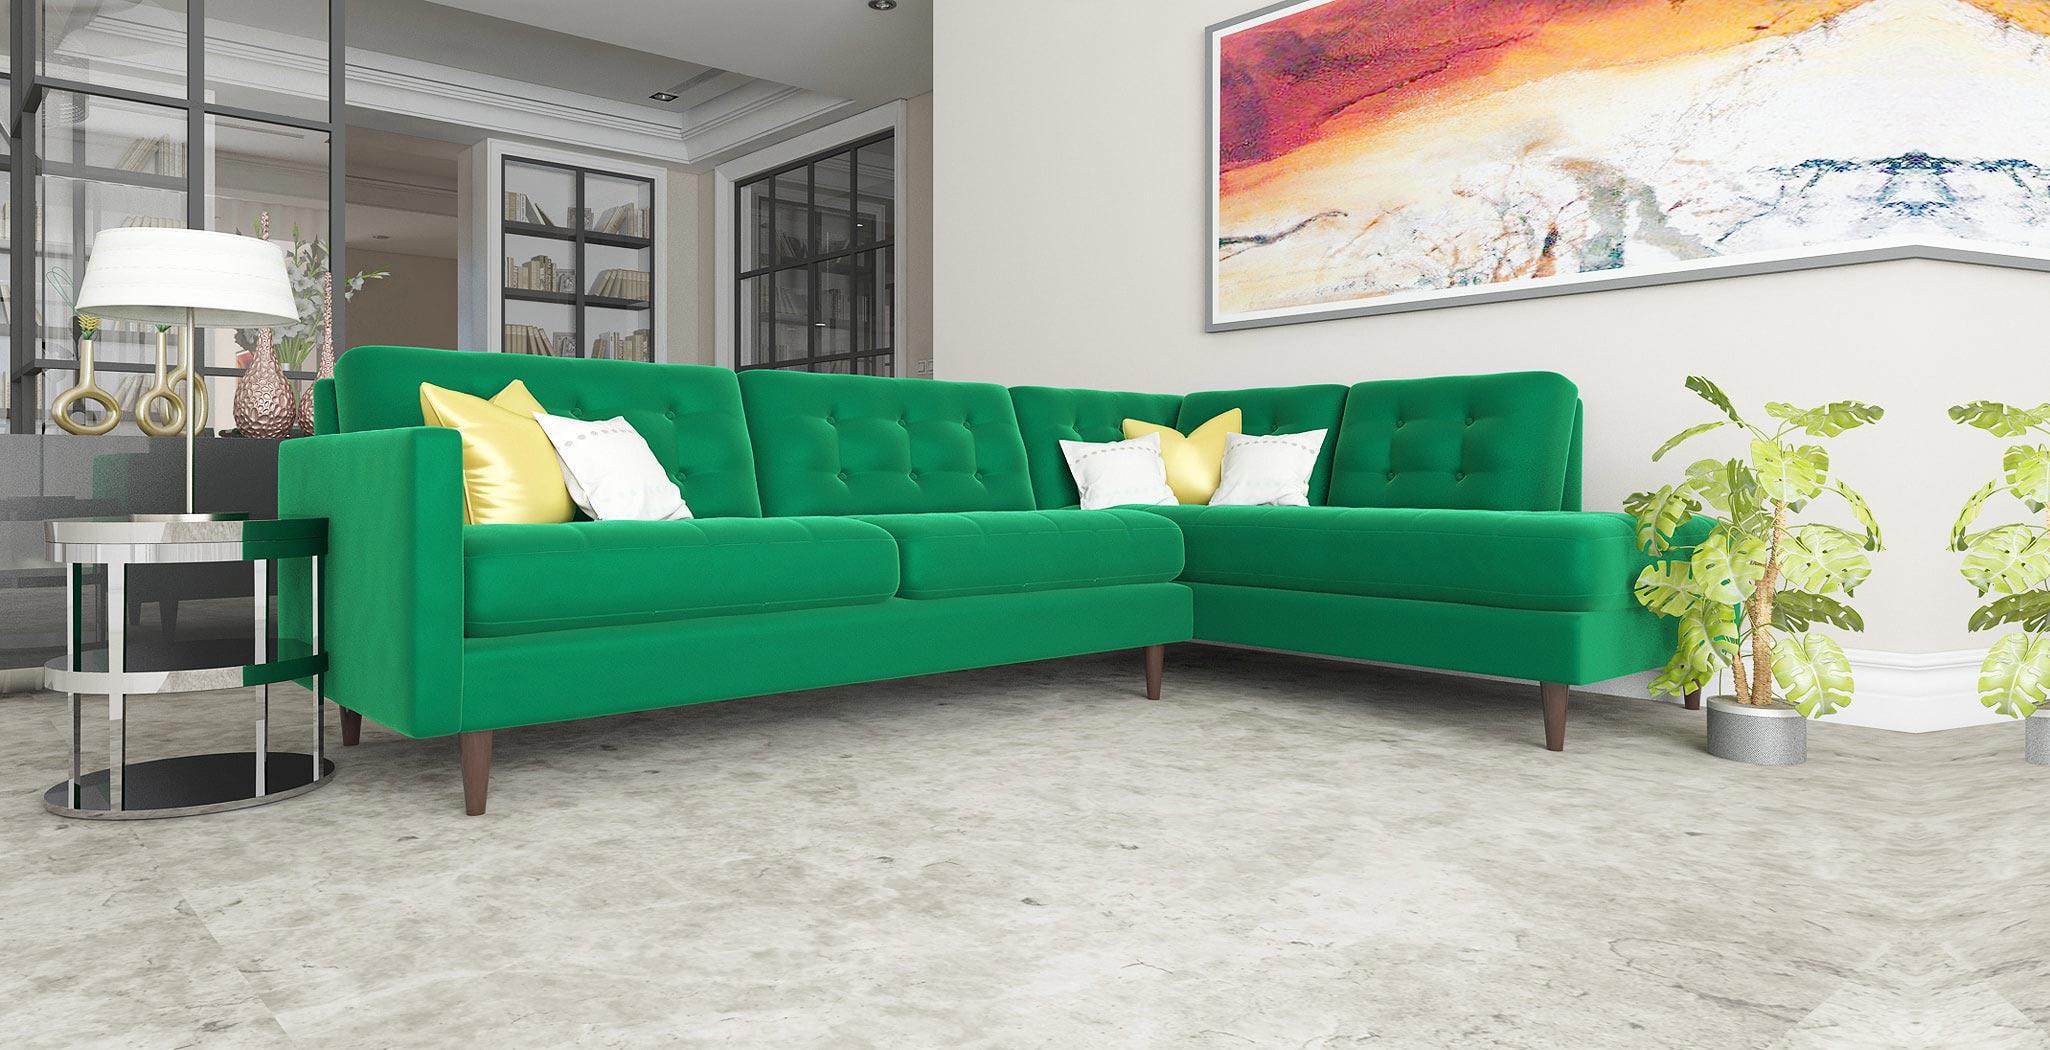 oslo panel furniture gallery 5